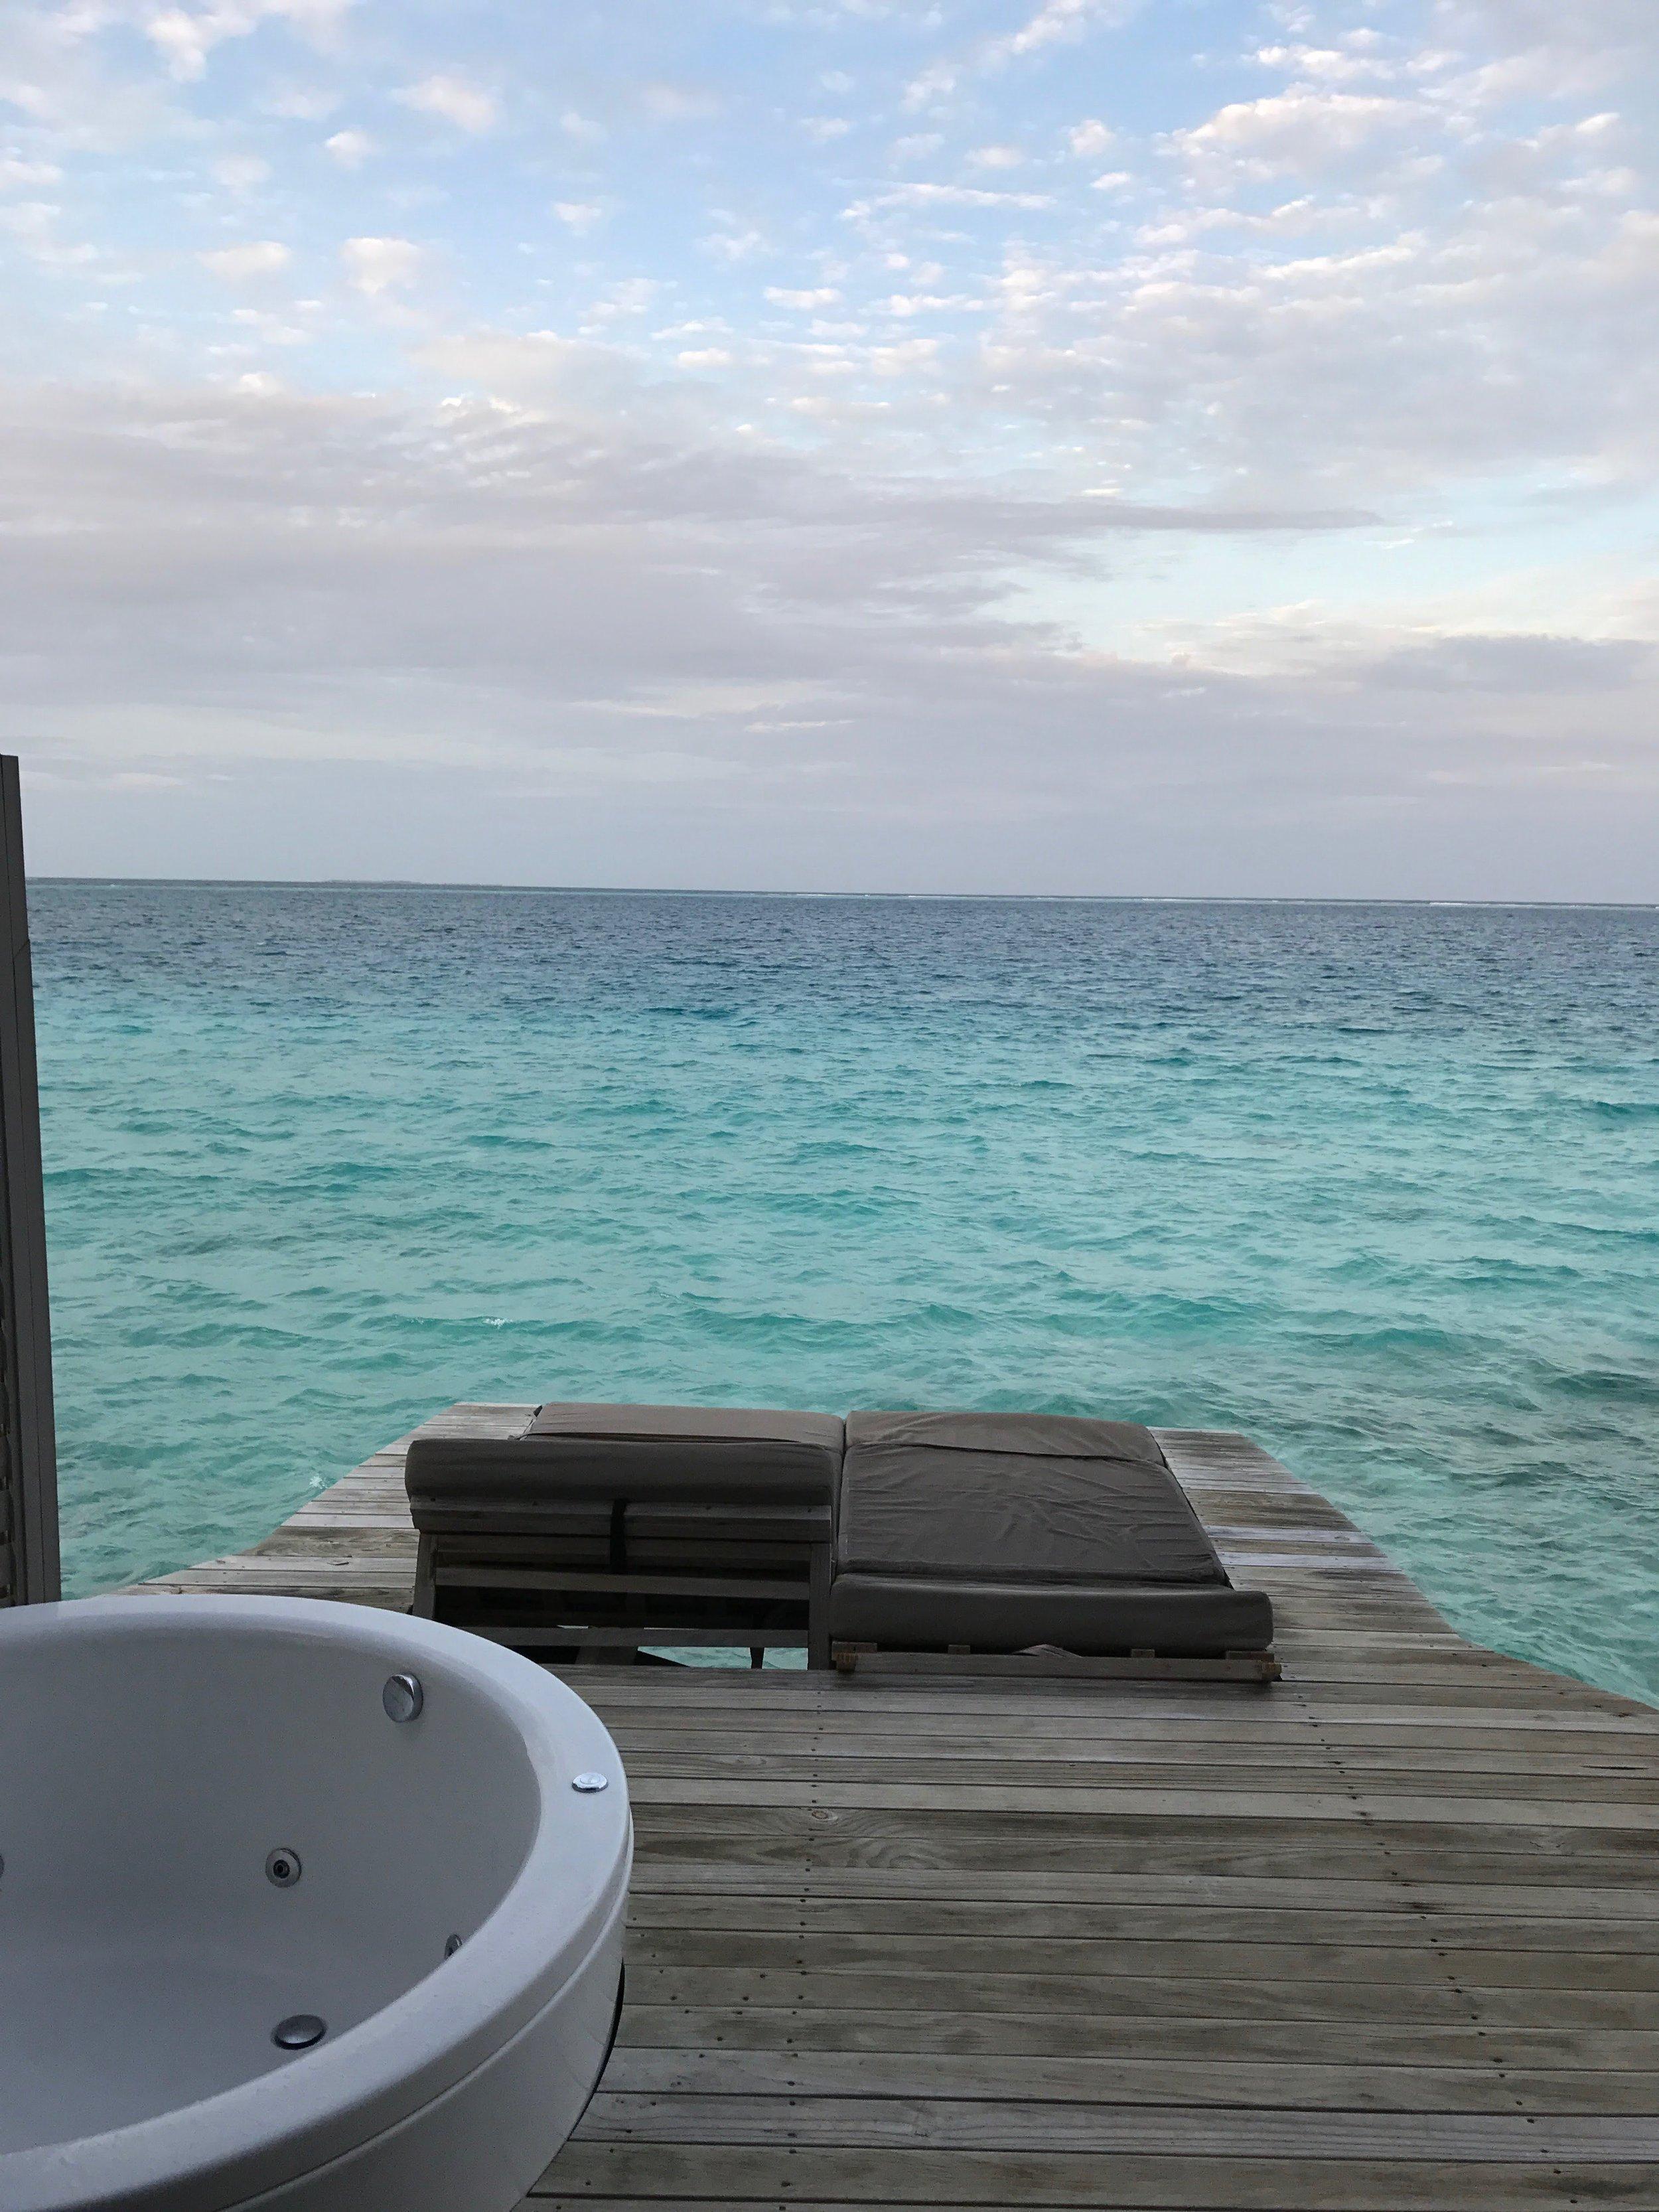 invite-to-paradise-maldives-sri-lanka-specialists-experts-travel-agent-tour-operator-customer-feedback-lucas-emily-fenning-elephant-orphanage-centara-ras-fushi-water-villa-2.jpg